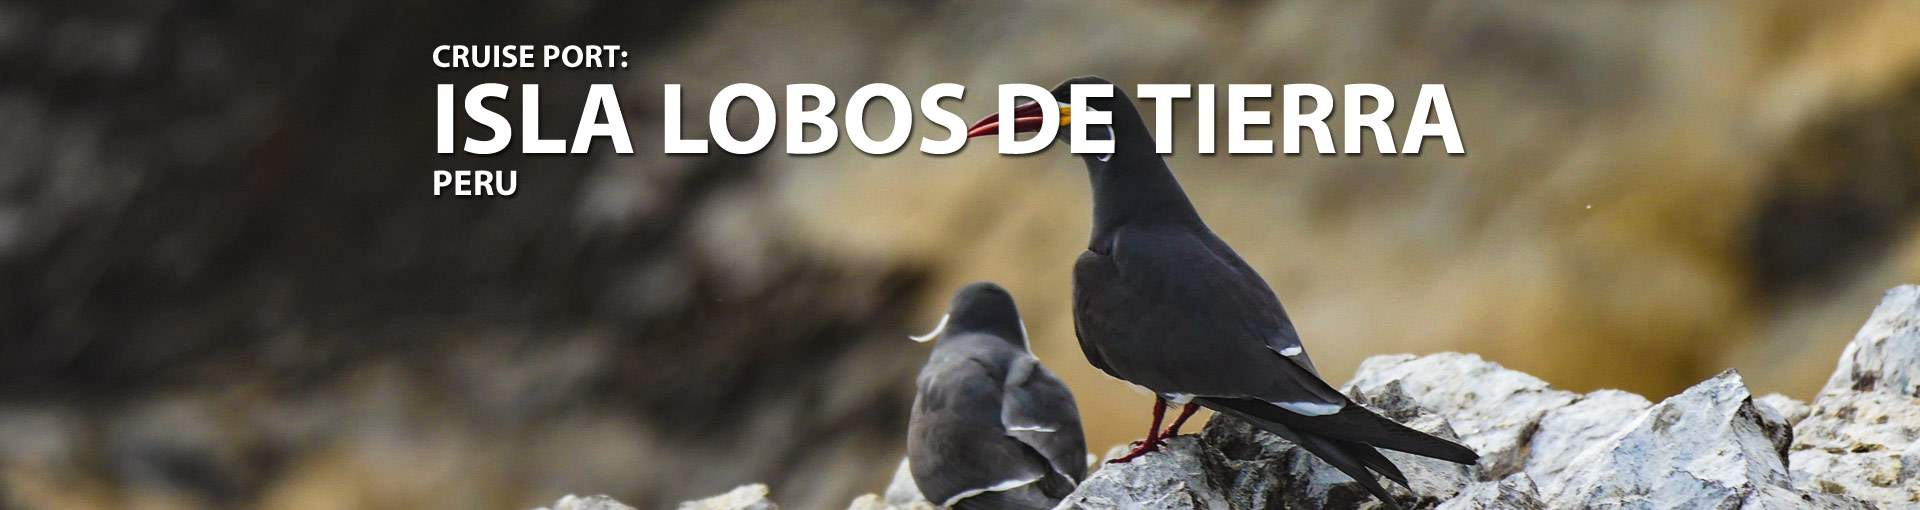 Isla Lobos De Tierra, Peru Cruise Port